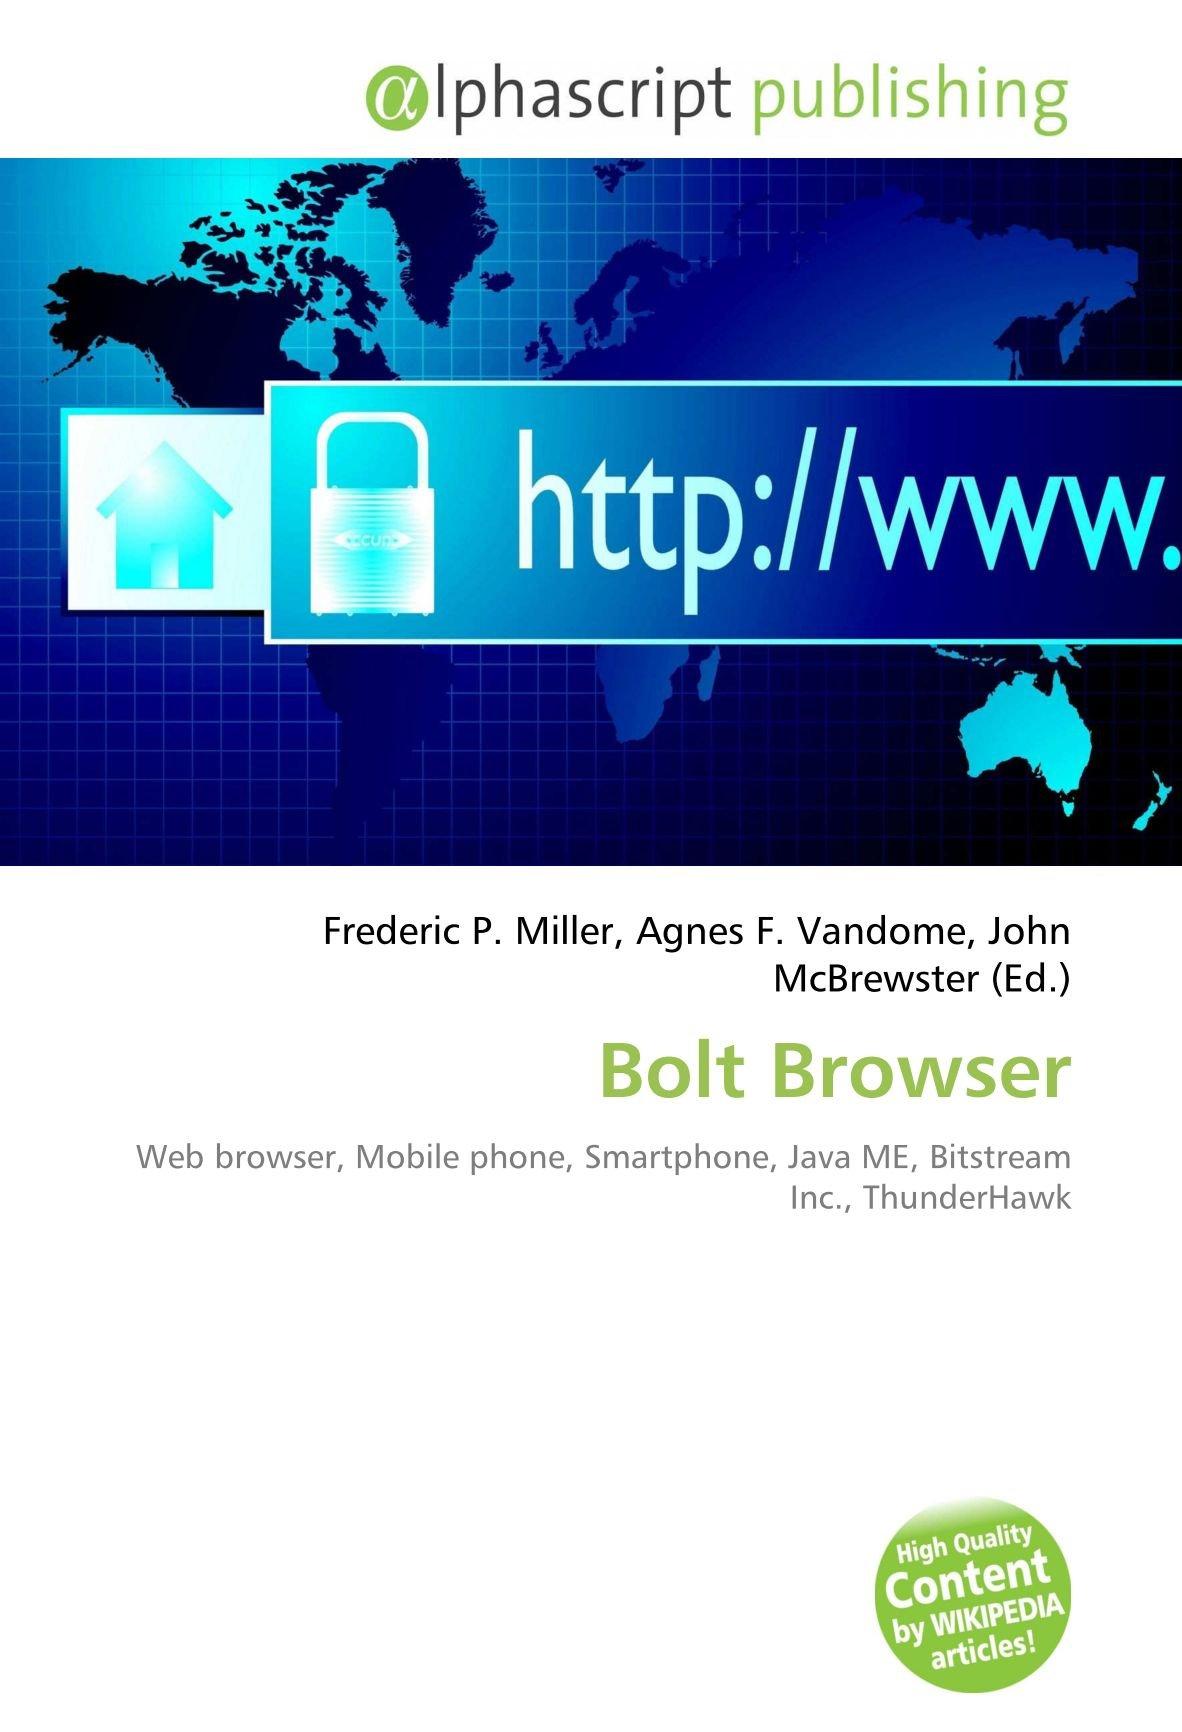 Amazon fr - Bolt Browser: Web browser, Mobile phone